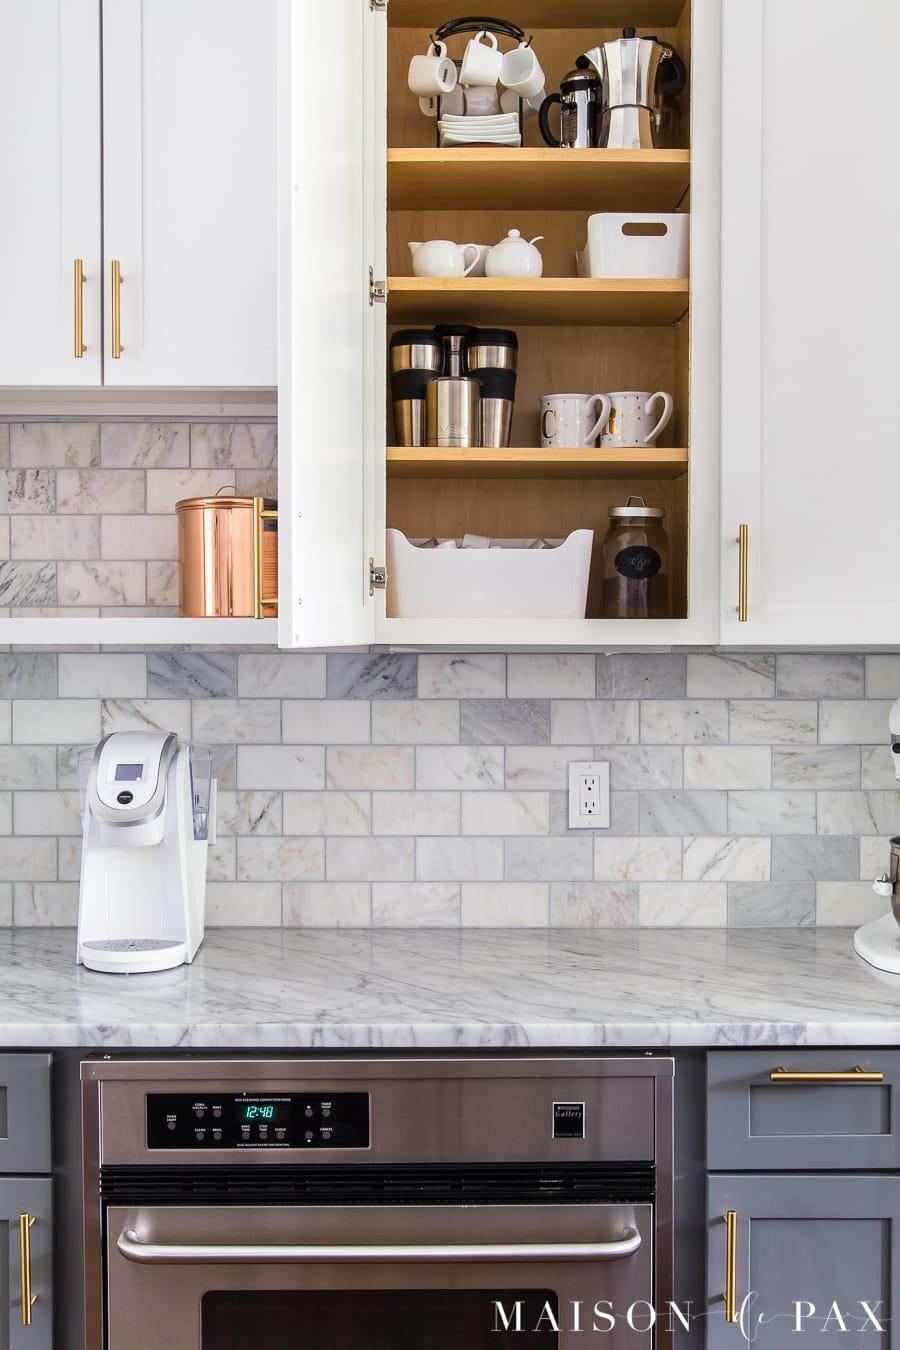 kitchen organizing ideas: coffee station... get 5 more tips for kitchen organizing! #kitchenorganization #organizing #kitchendesign